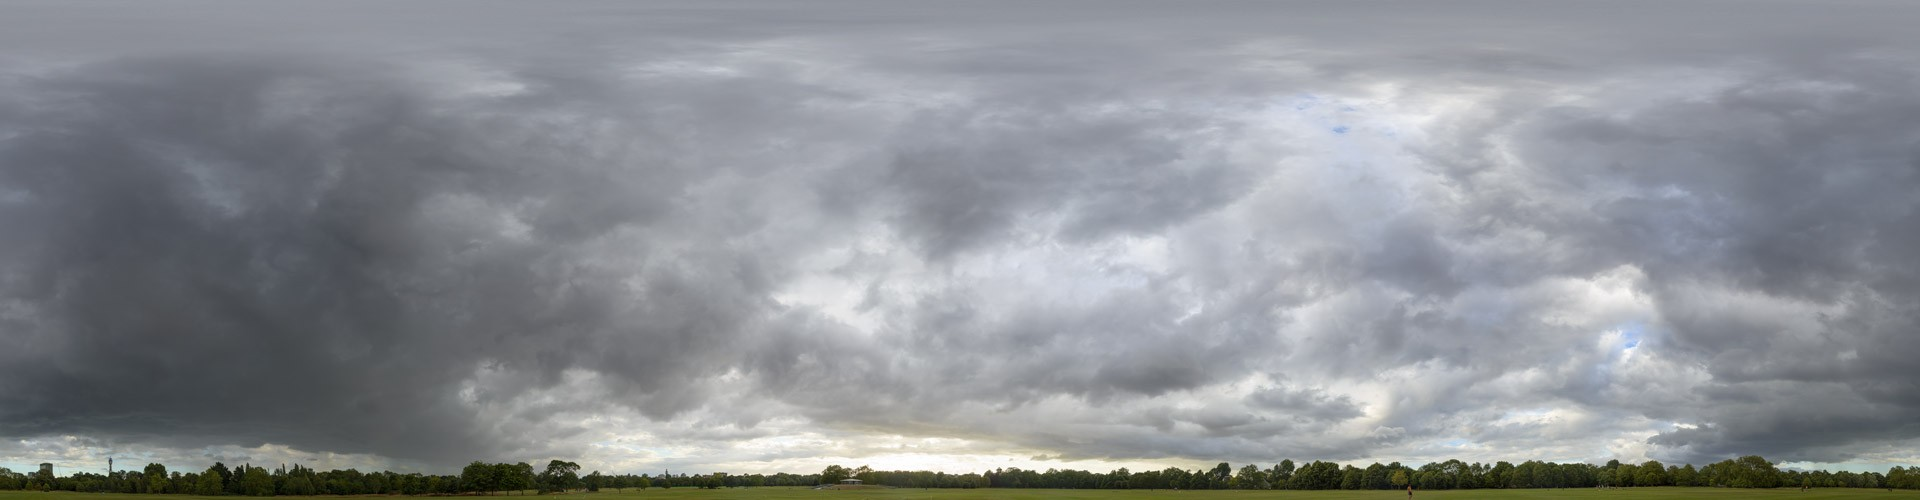 Storm 3422 (30k)